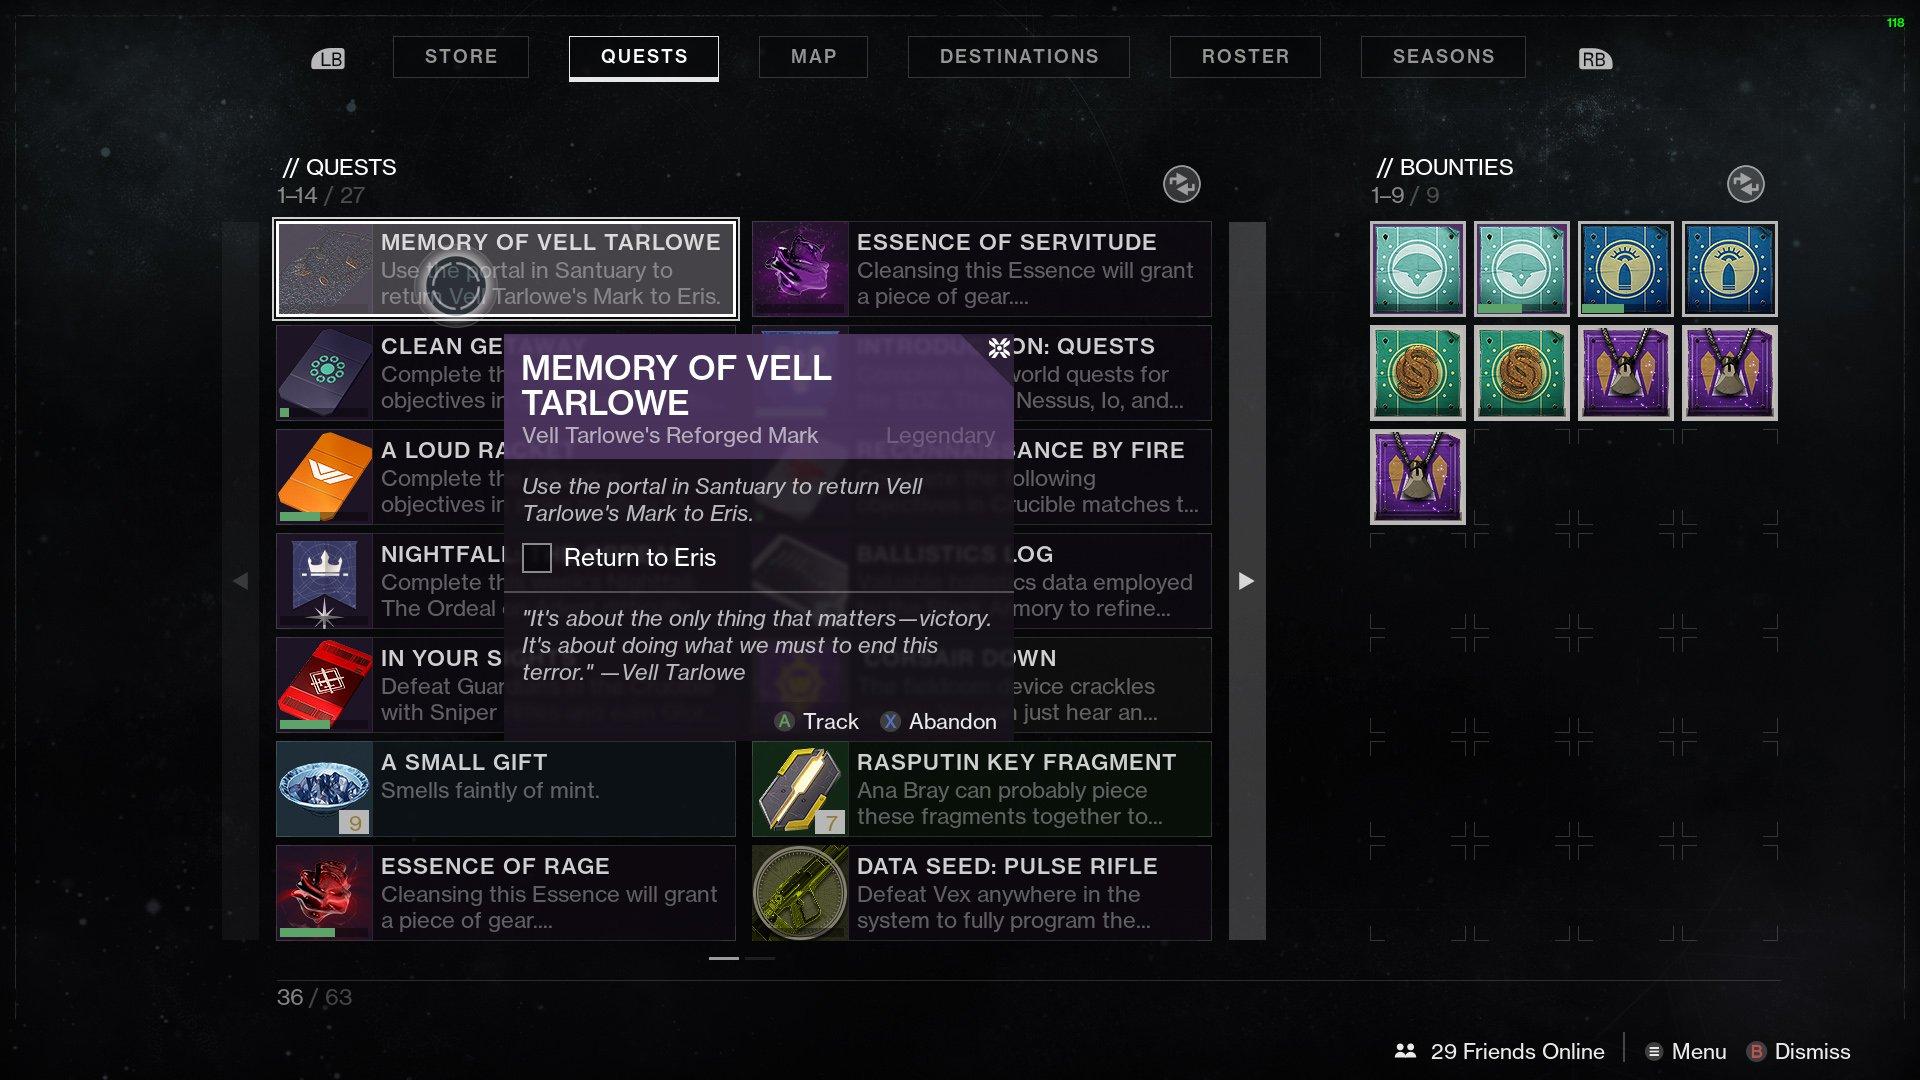 Destiny 2 Memory Vell Tarlowe